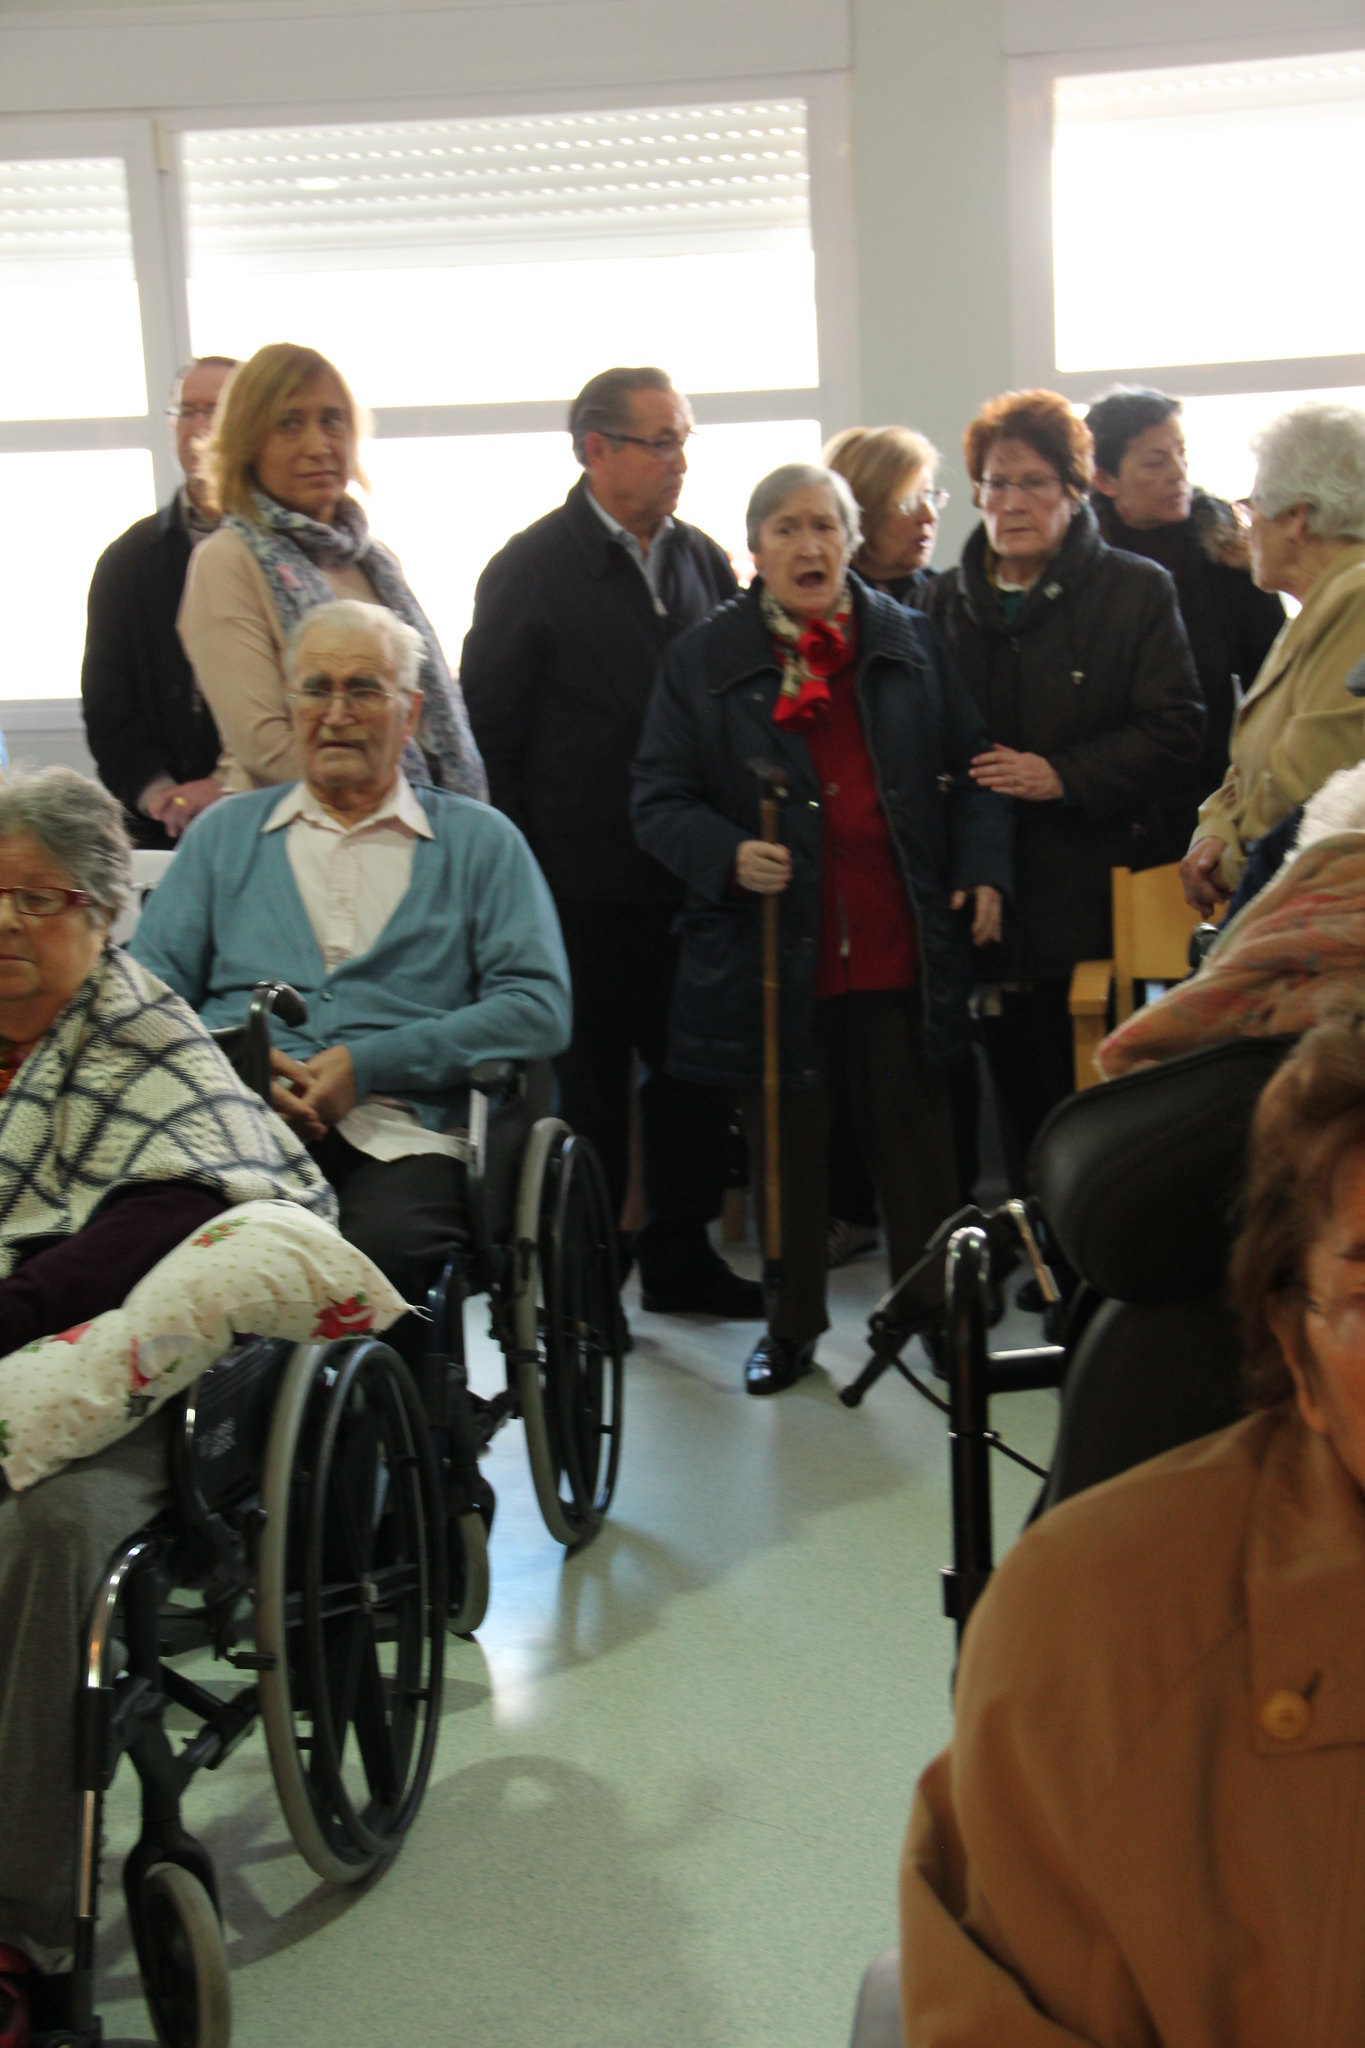 (2016-02-13) - Inauguración Virgen De Lourdes, La Molineta - Archivo La Molineta (029)